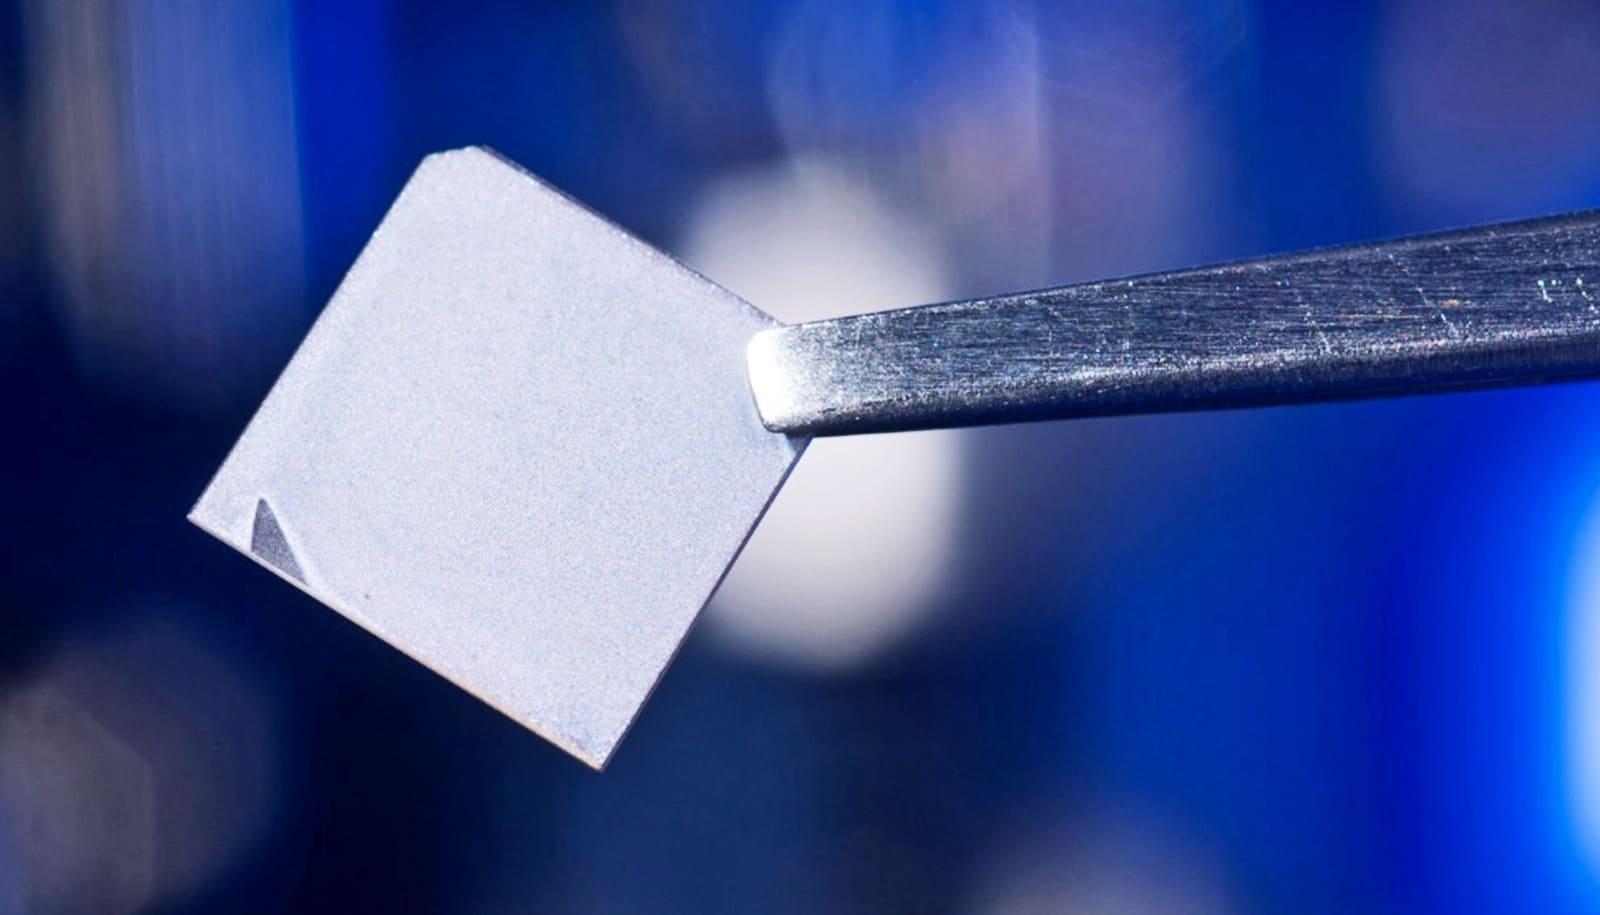 https://www.futurity.org/wp/wp-content/uploads/2019/12/barium-zirconium-sulfide-semiconductors-solar-panels_1600.jpg